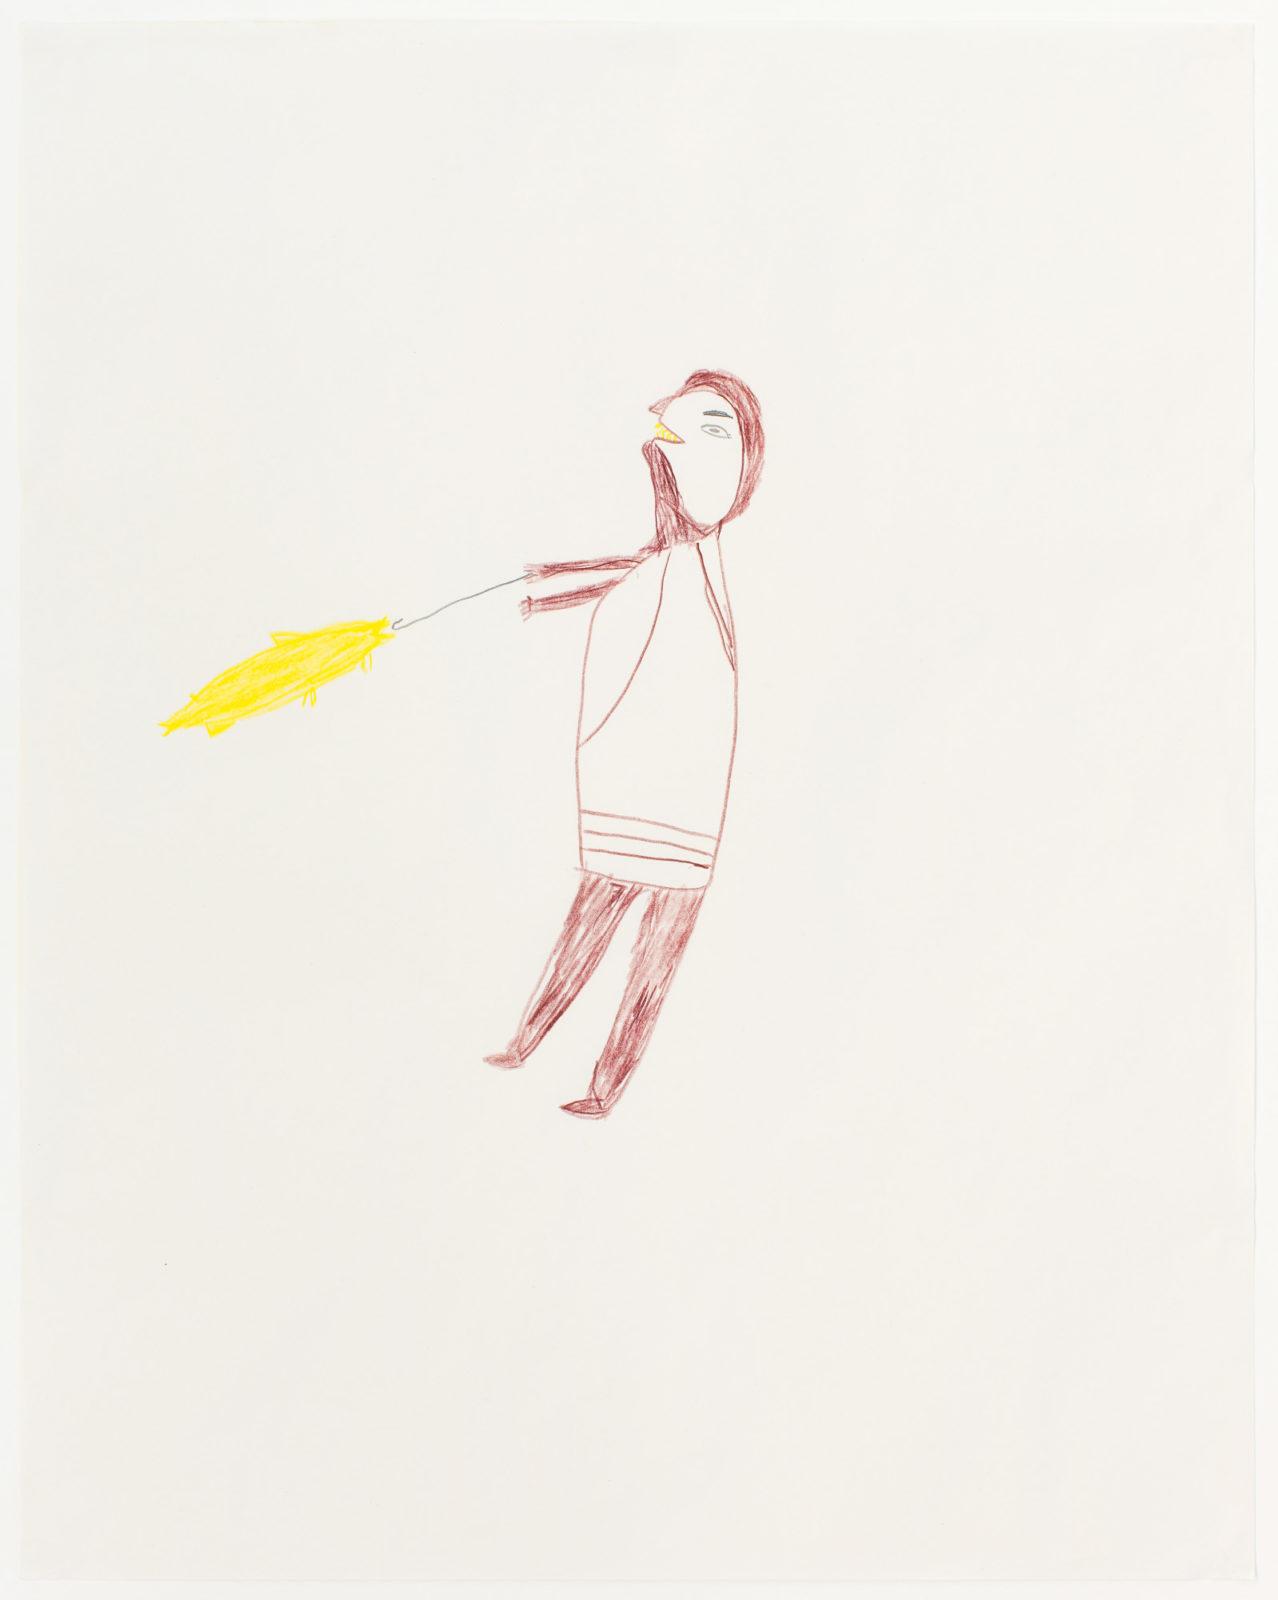 Luke Anguhadluq - untitled (man and fish)